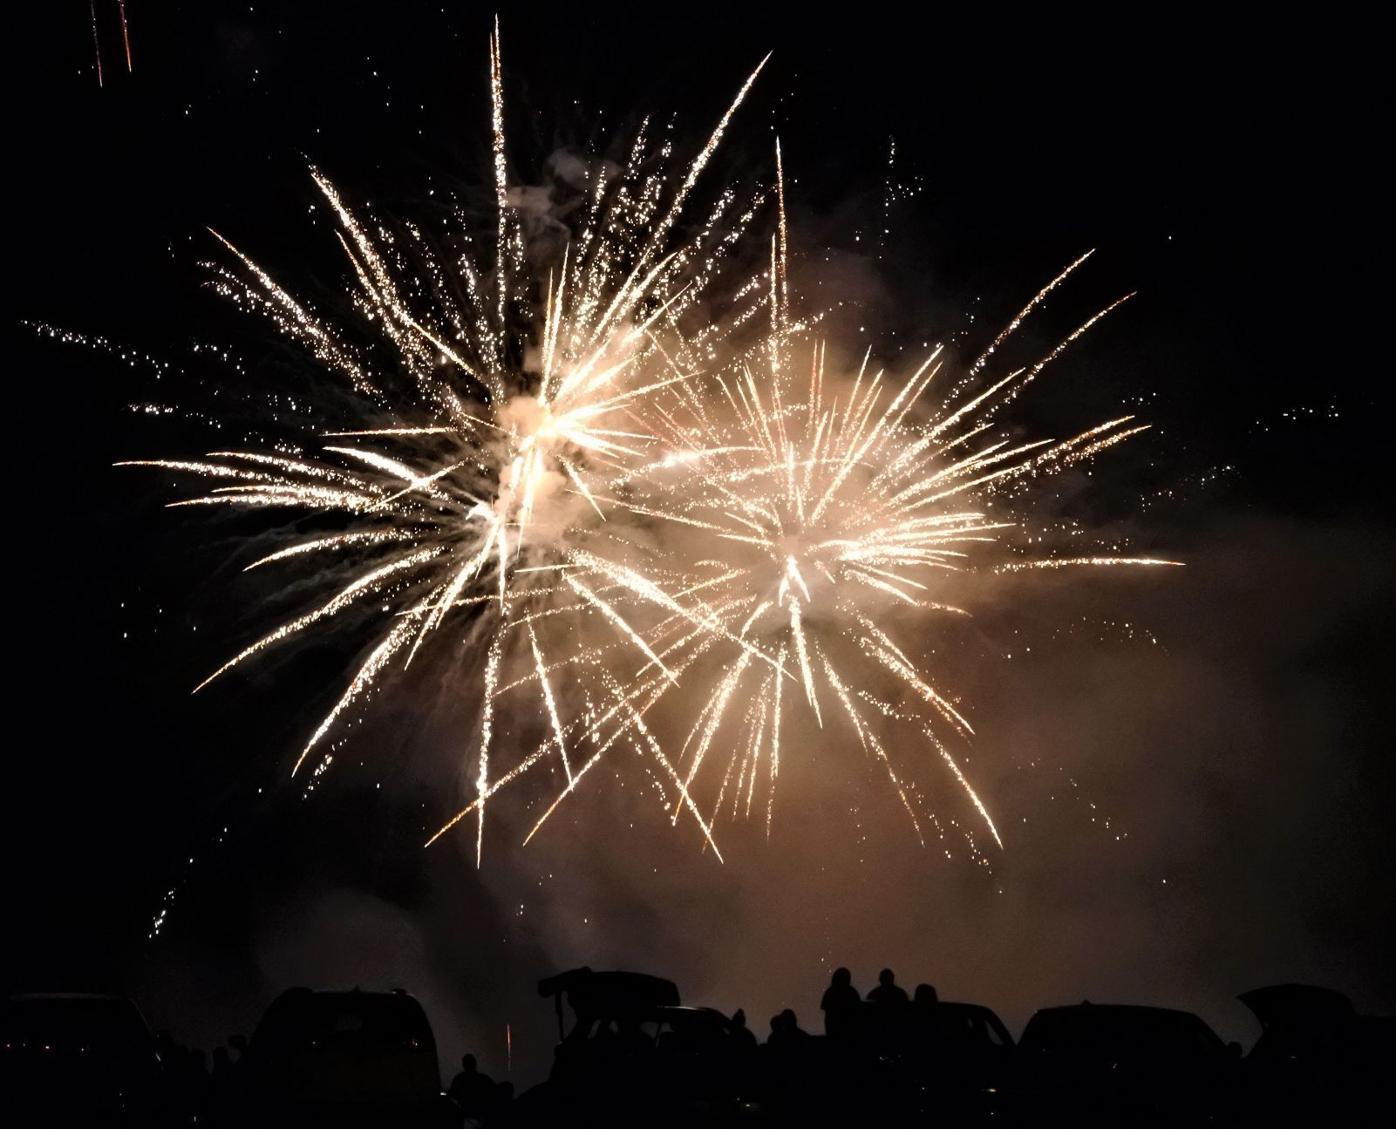 Celebrating 'Independence Day'